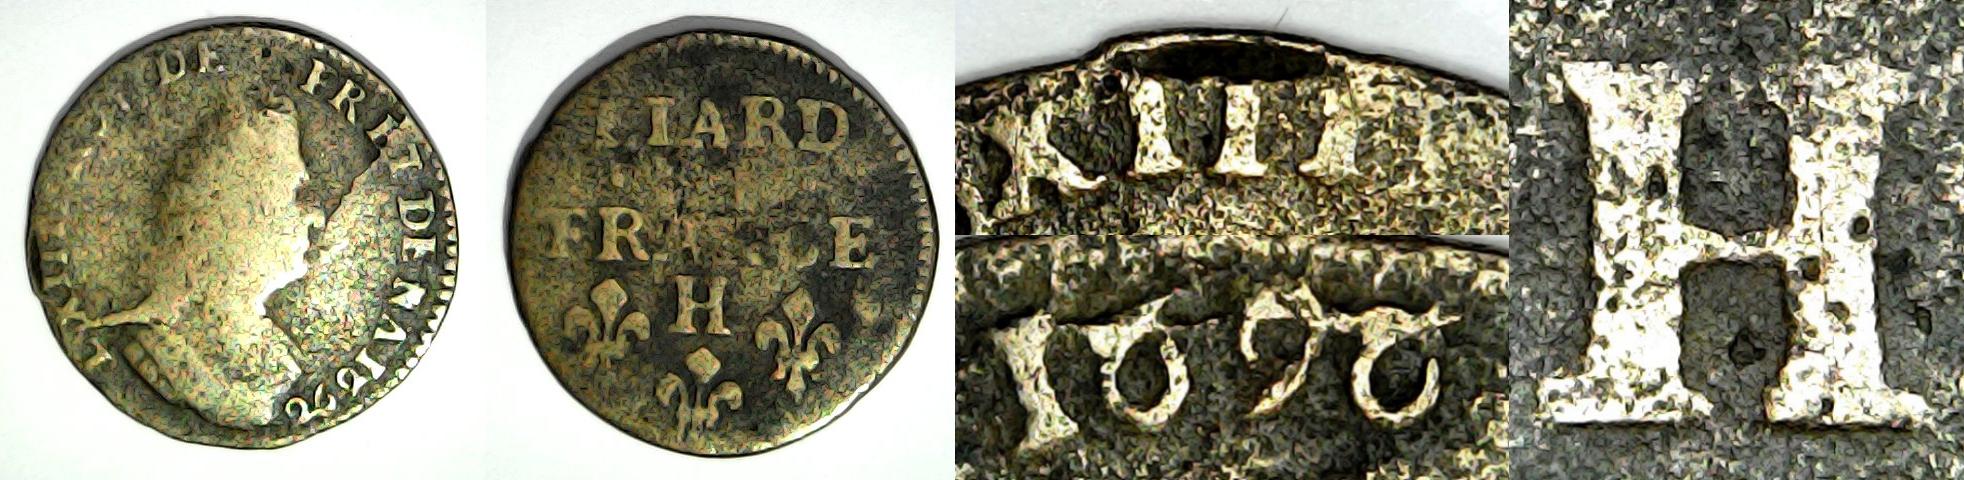 1 liard de France 1696 H France